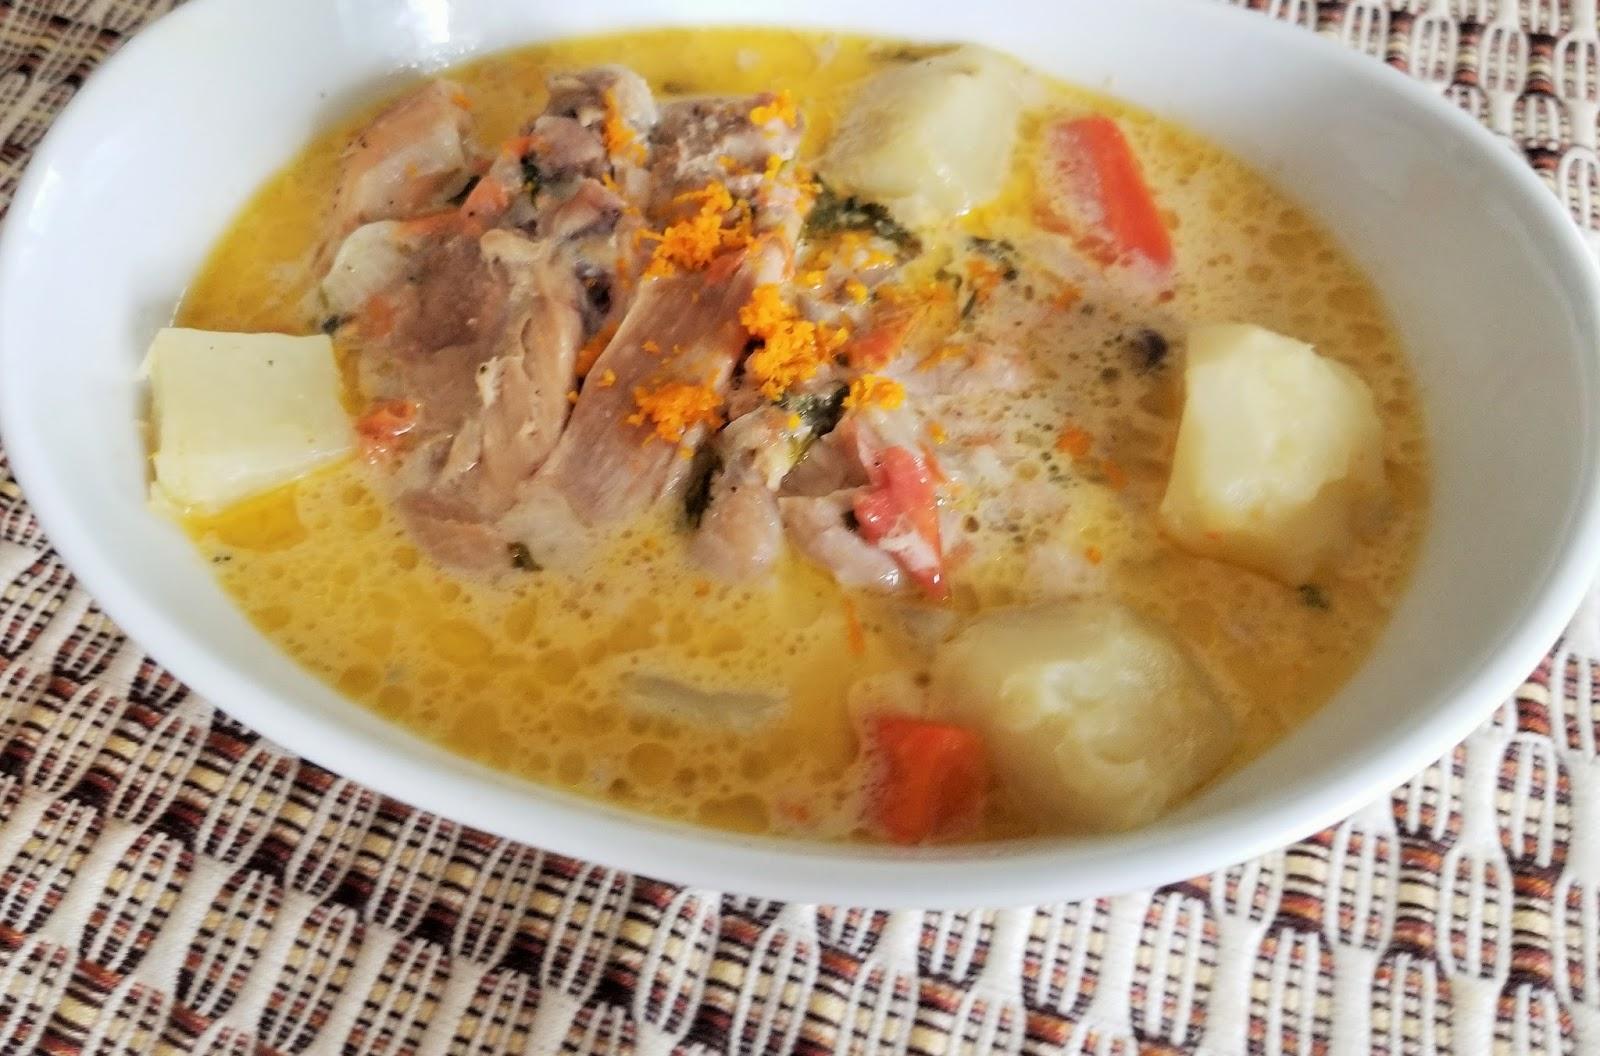 Receta De Pollo En Crema De Guatemala Recetas Con Sabor Latino